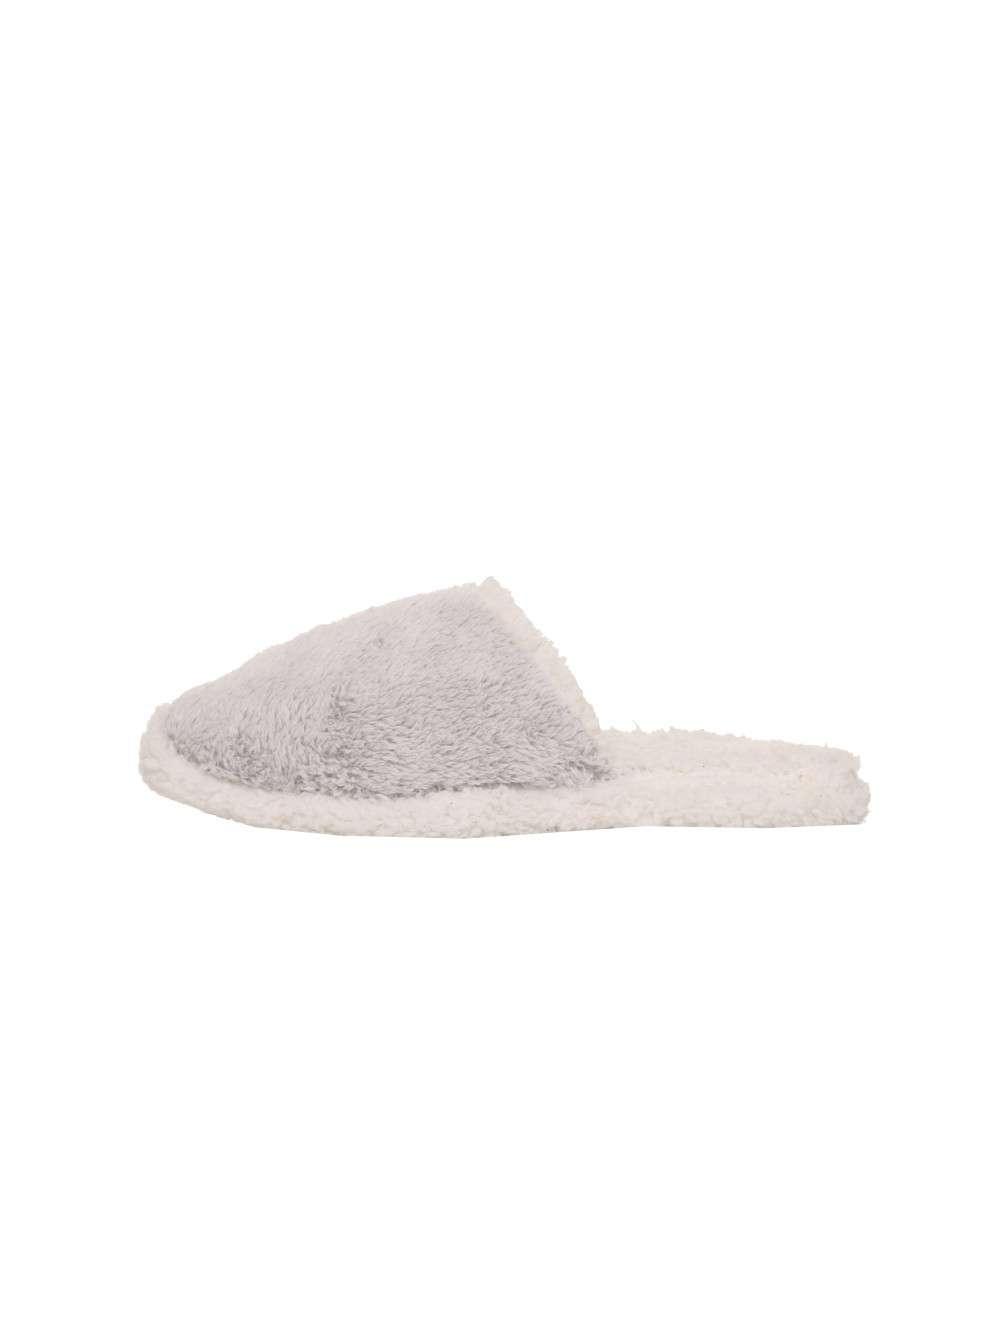 CHOUCHOU slippers